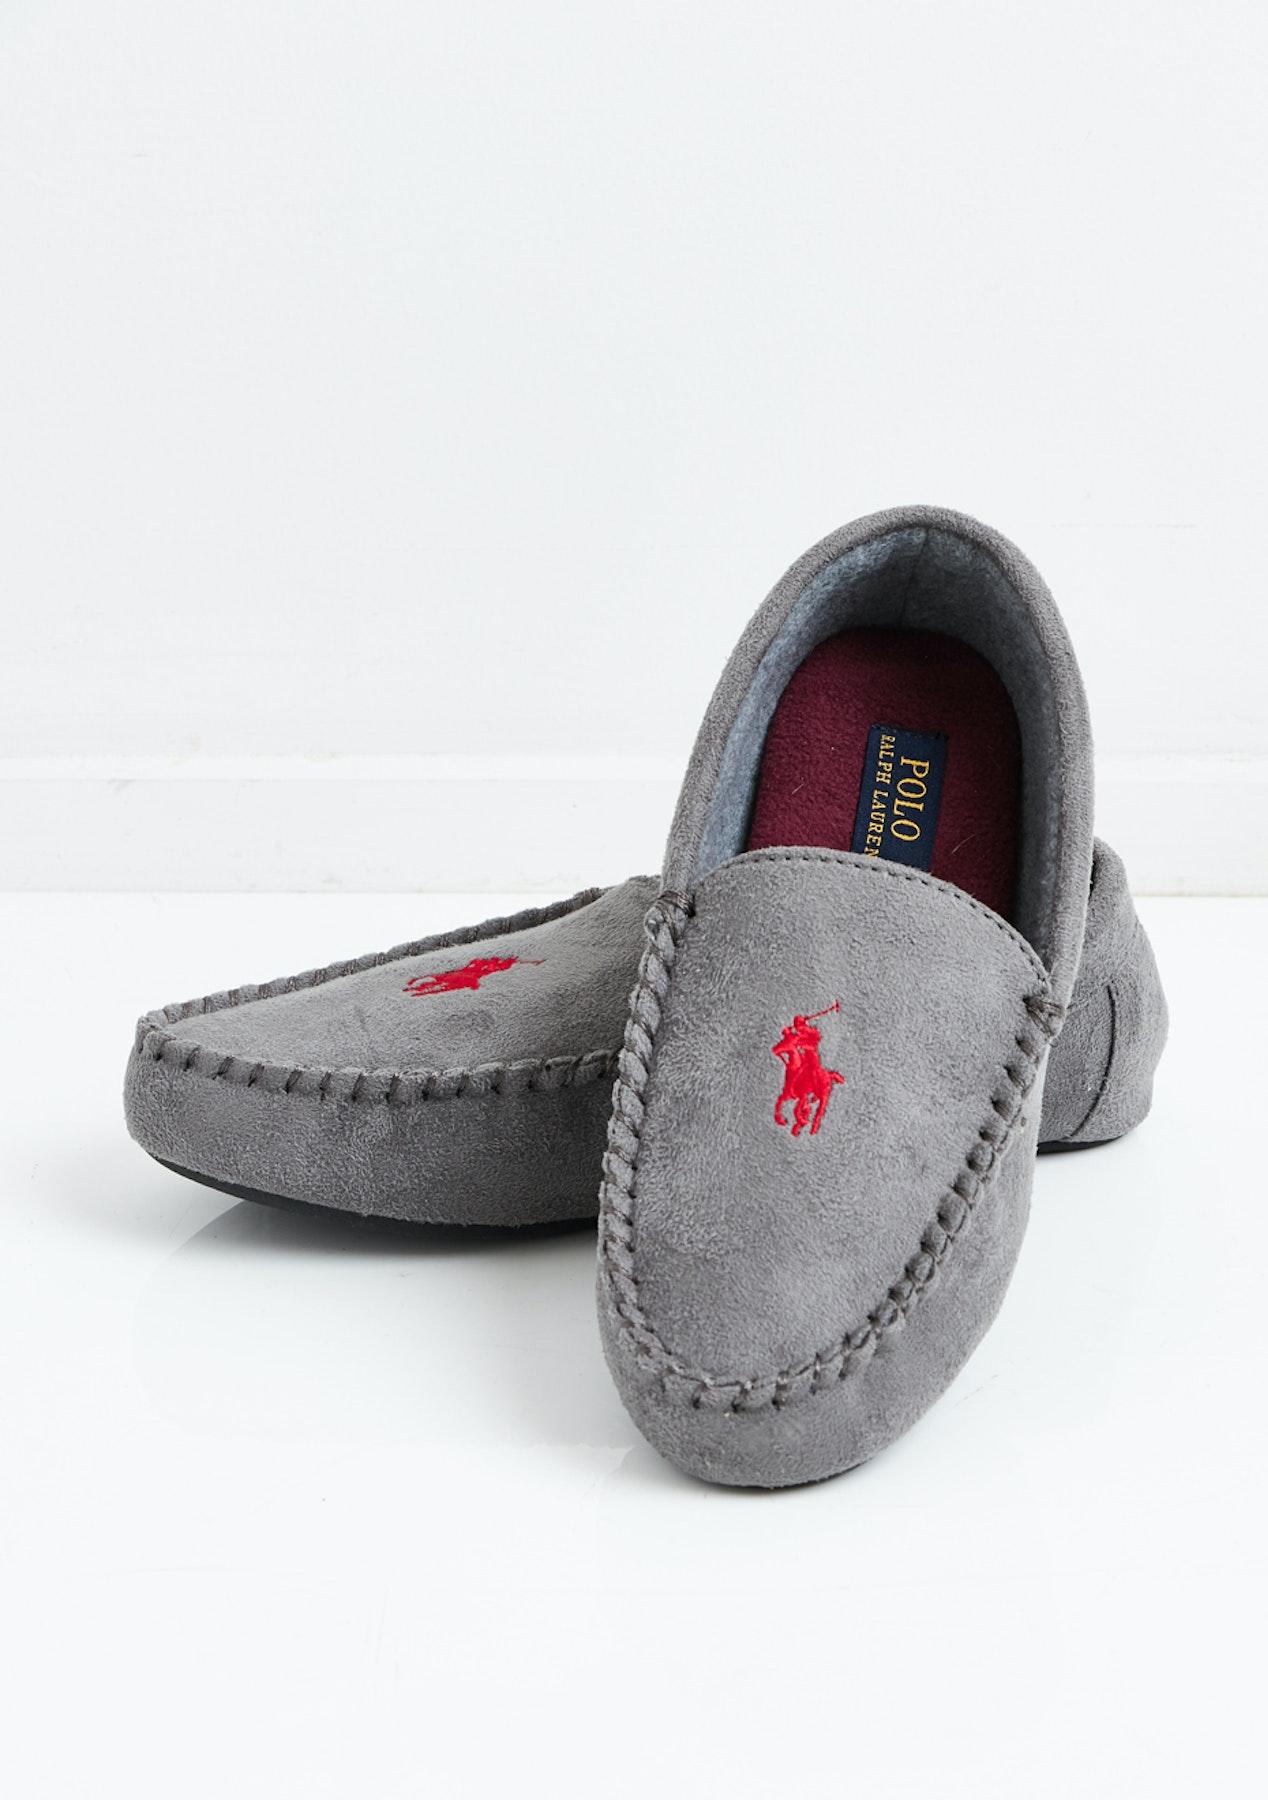 3fac60e4ea8cb Polo Ralph Lauren Men s - DEZi II Slipper - Polo Ralph Lauren Slippers -  Onceit